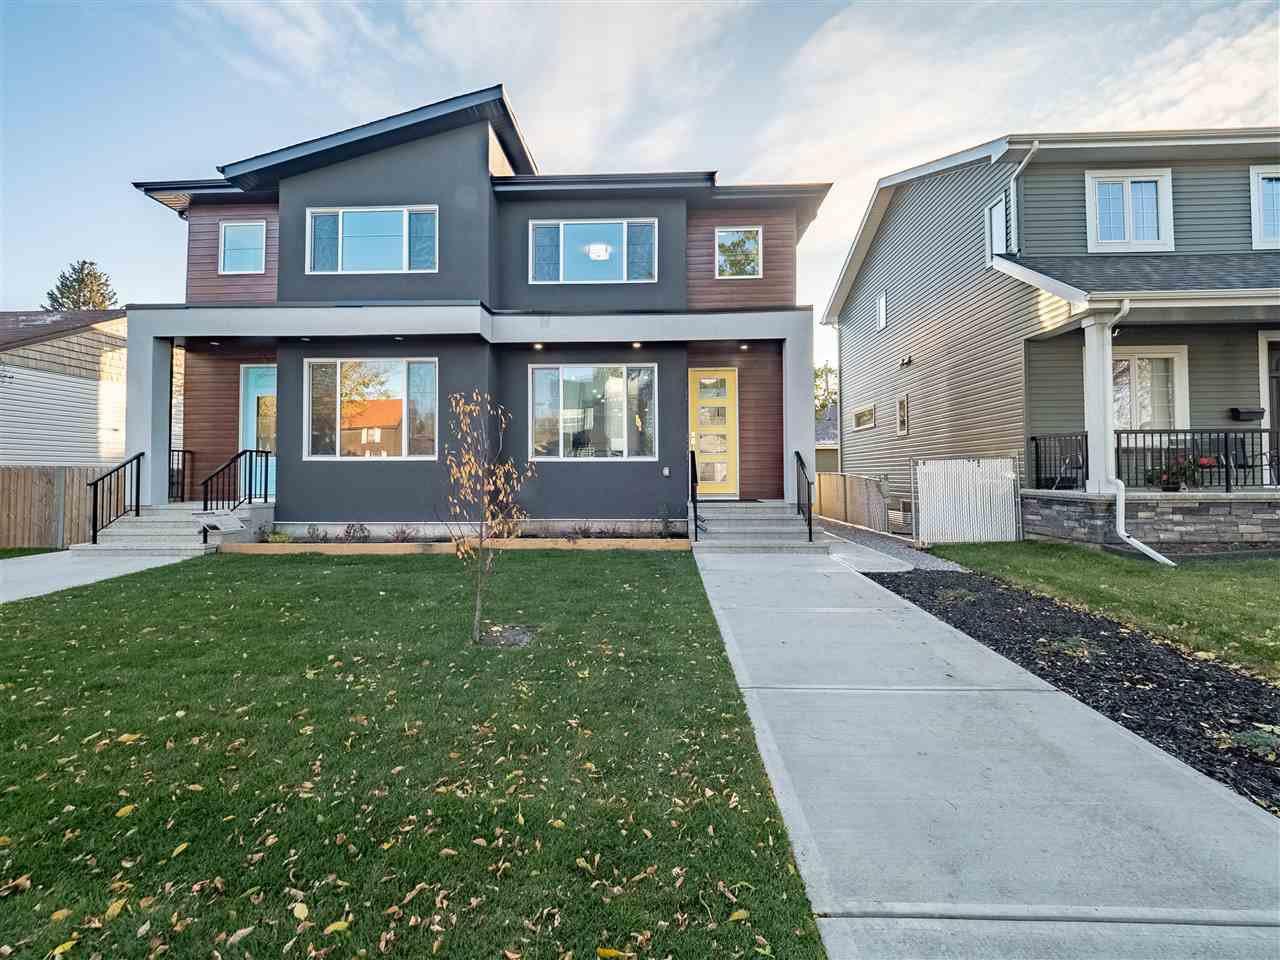 Main Photo: 8829 92 Street in Edmonton: Zone 18 House Half Duplex for sale : MLS®# E4177413